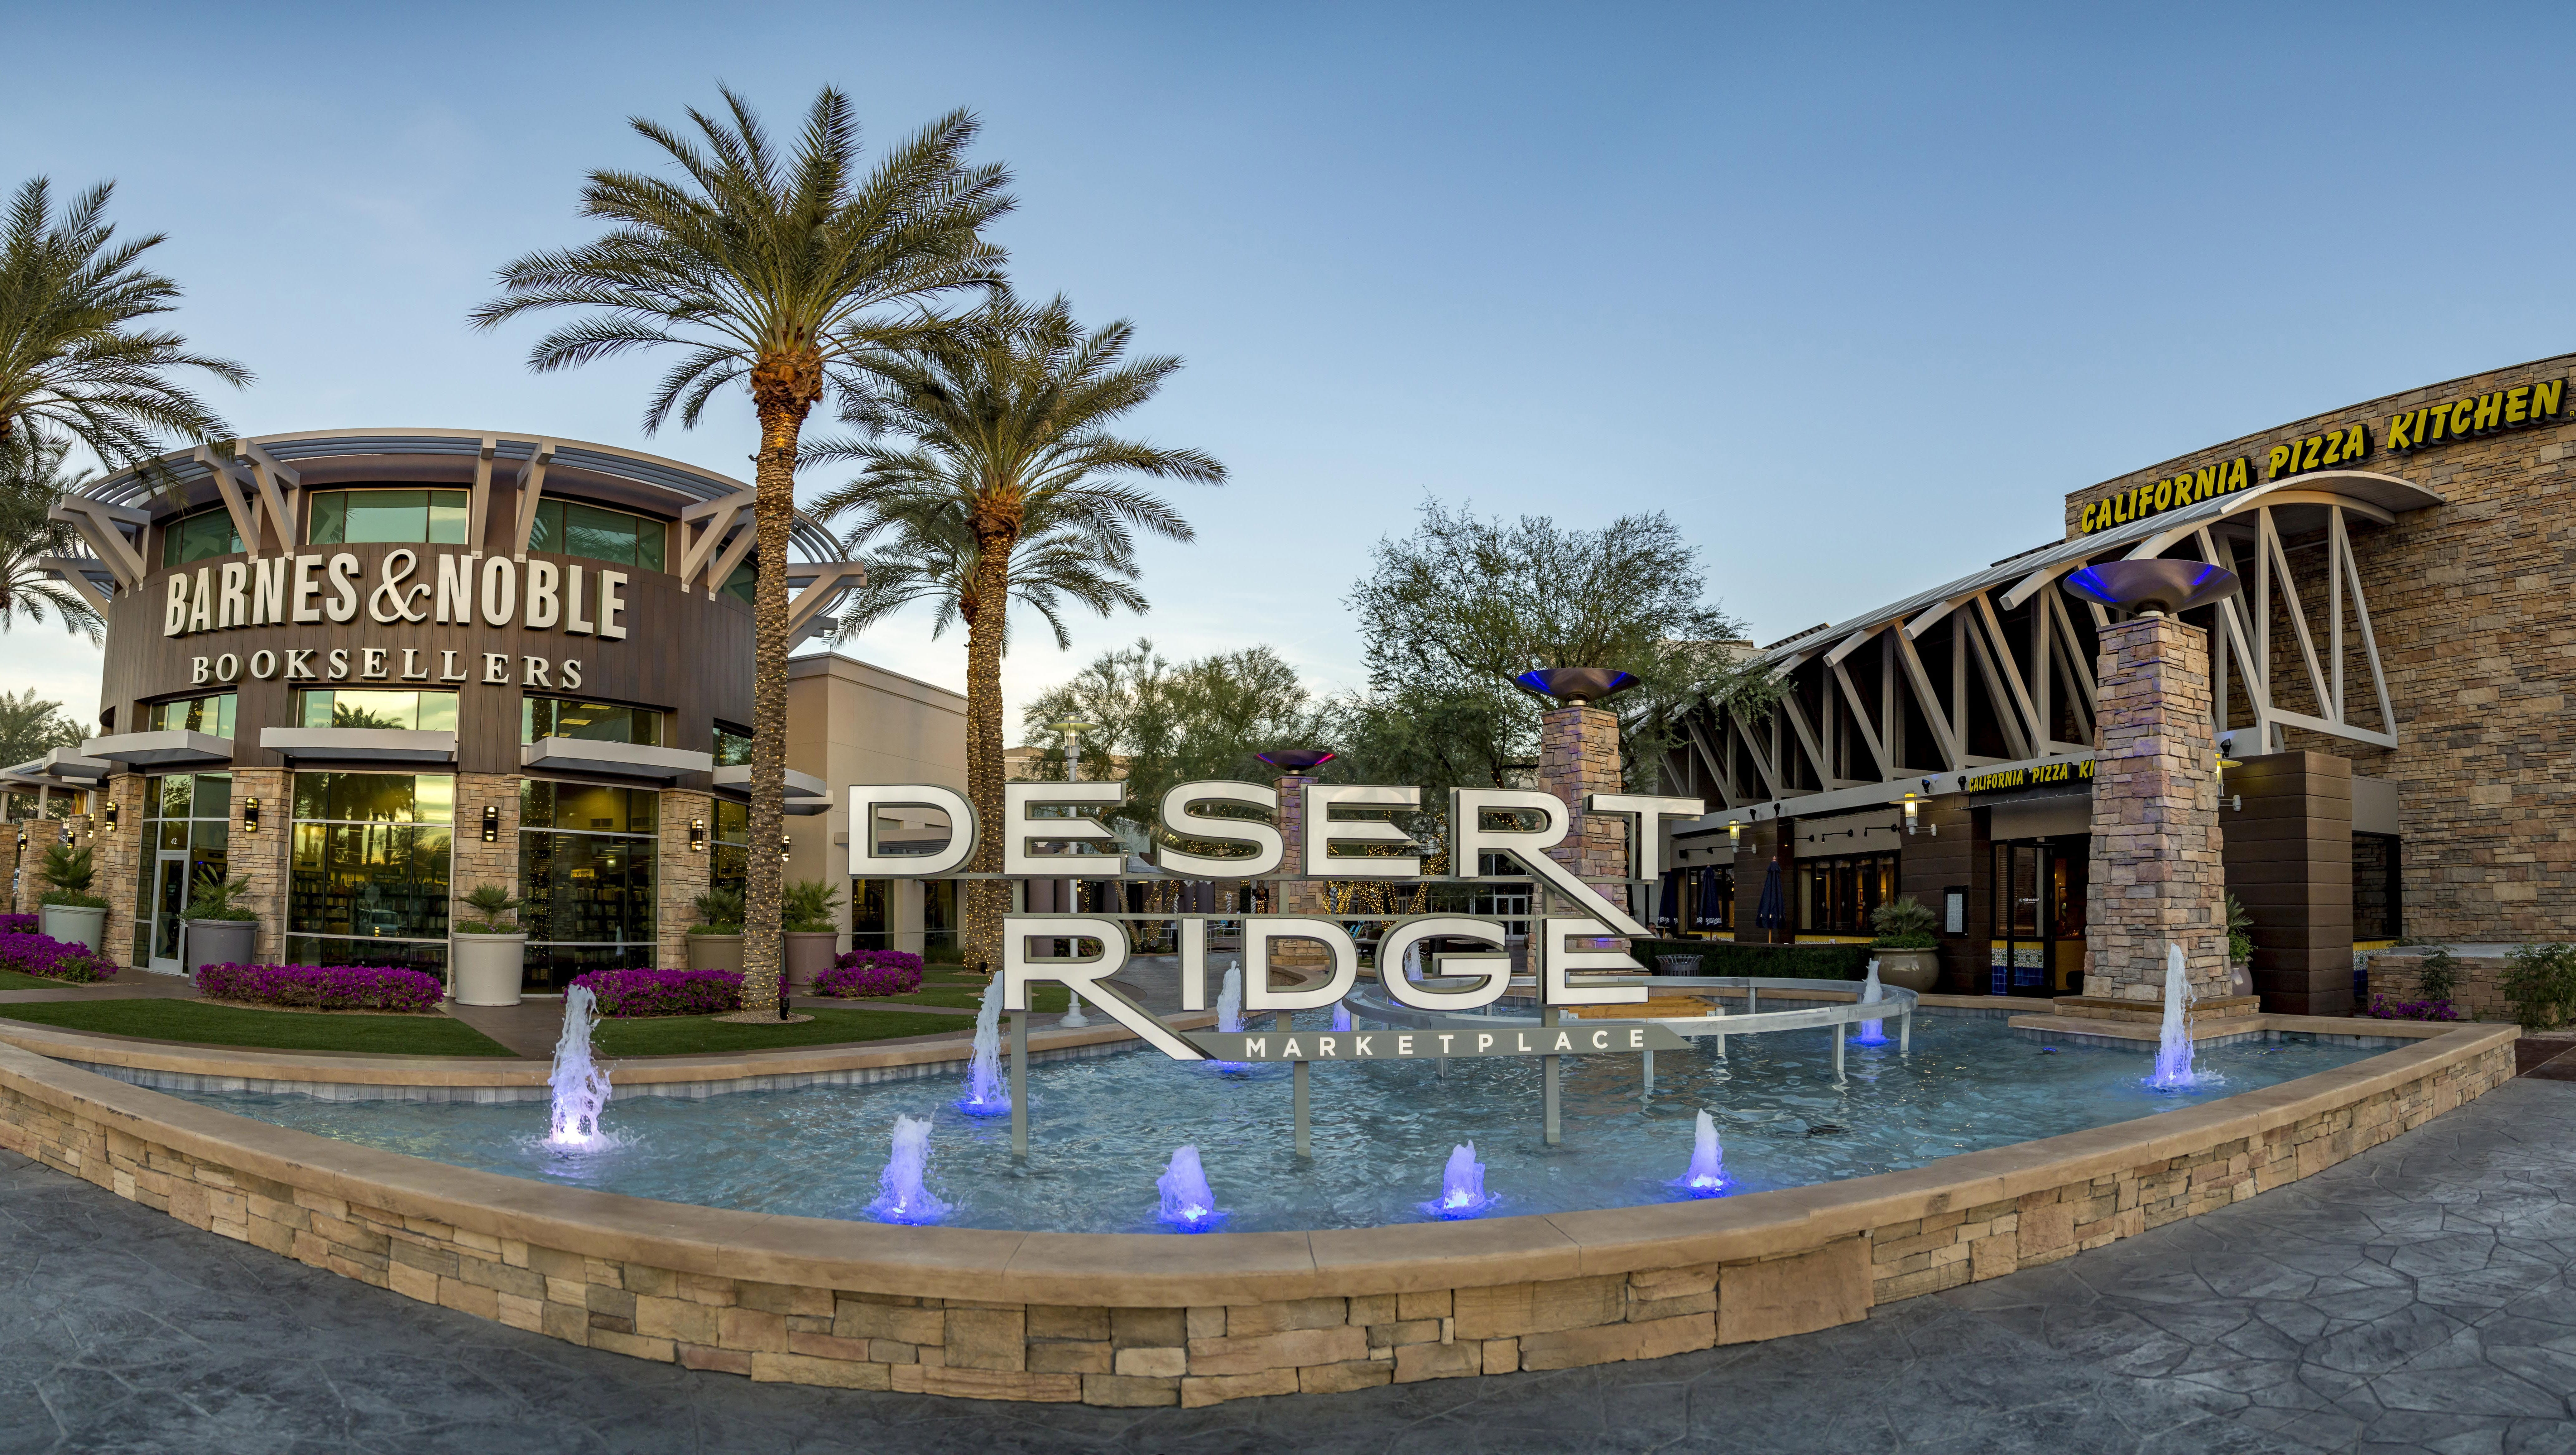 Cb Live Hiring 150 People At Desert Ridge Marketplace In Phoenix